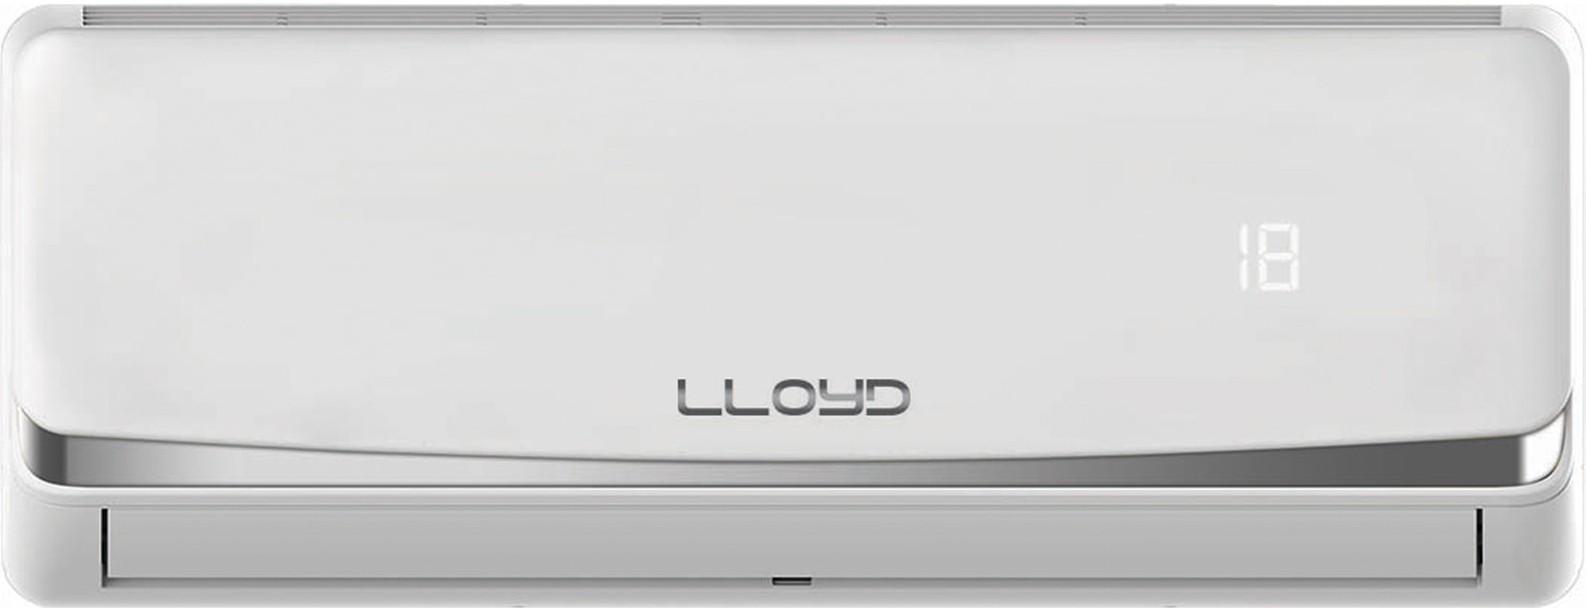 Lloyd LS19B22FI 1.5 Ton 2 Star BEE Rating 2018 Split AC with Wi-fi Connect Image